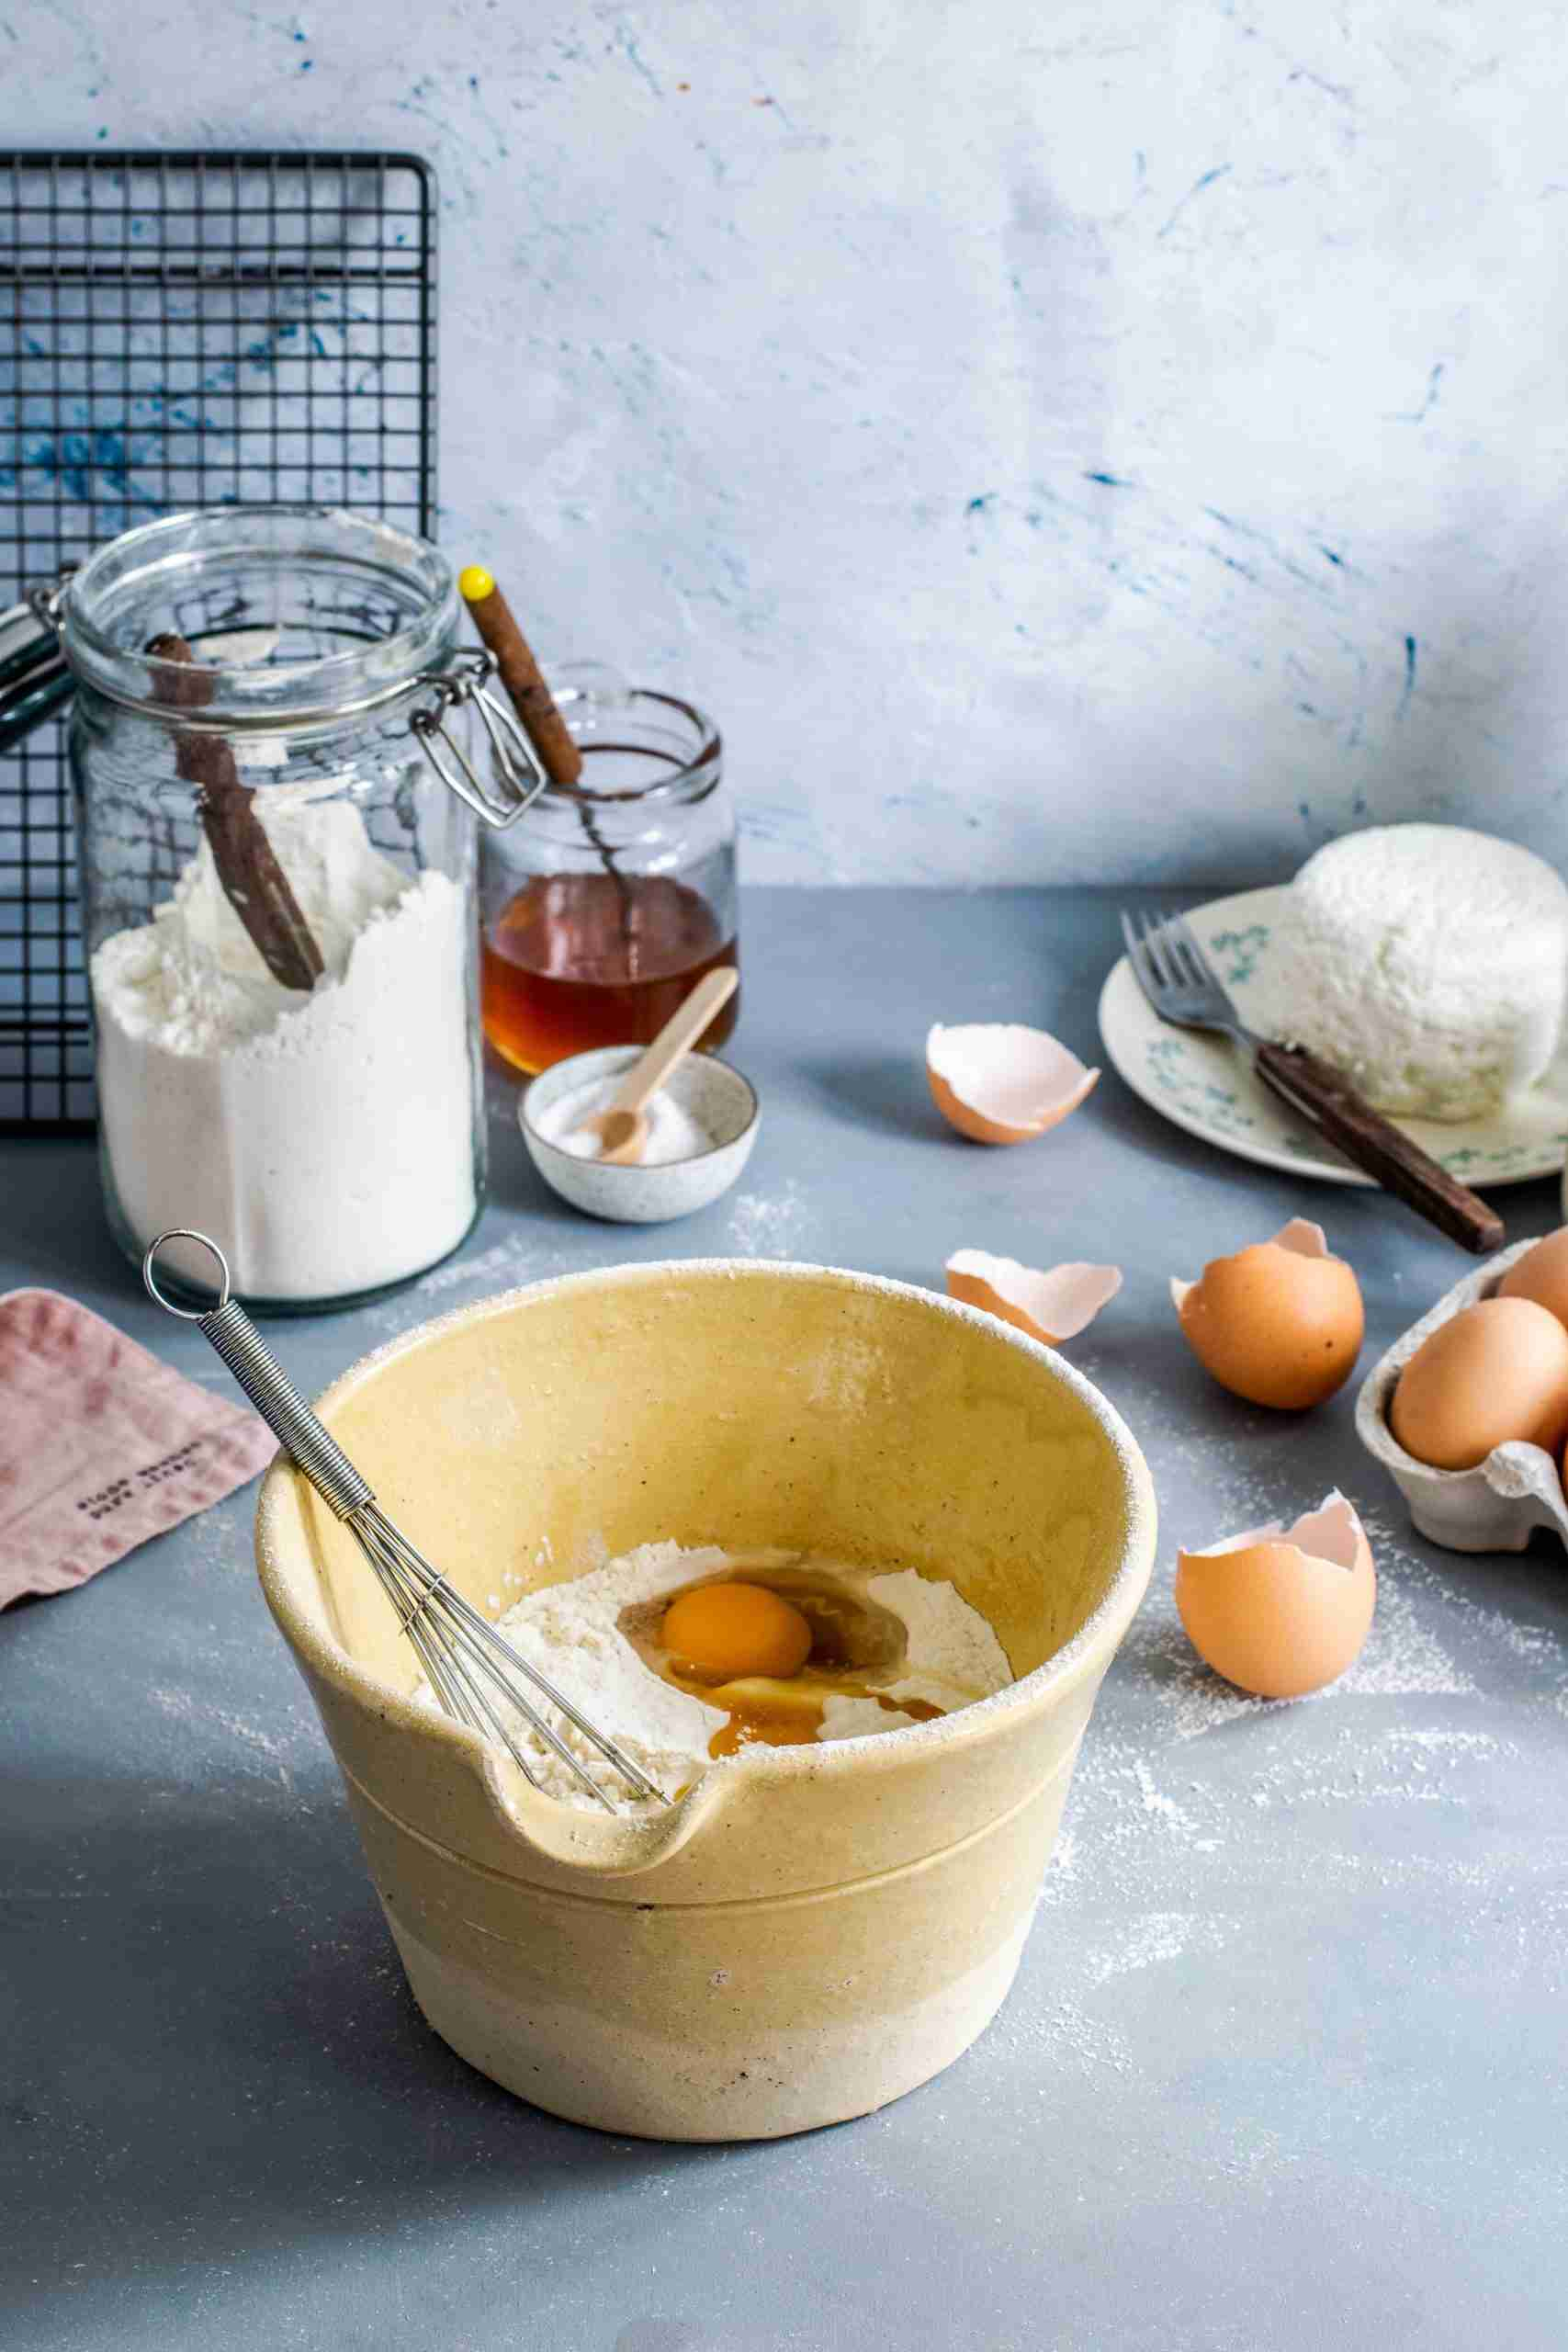 Baking utensils on the counter